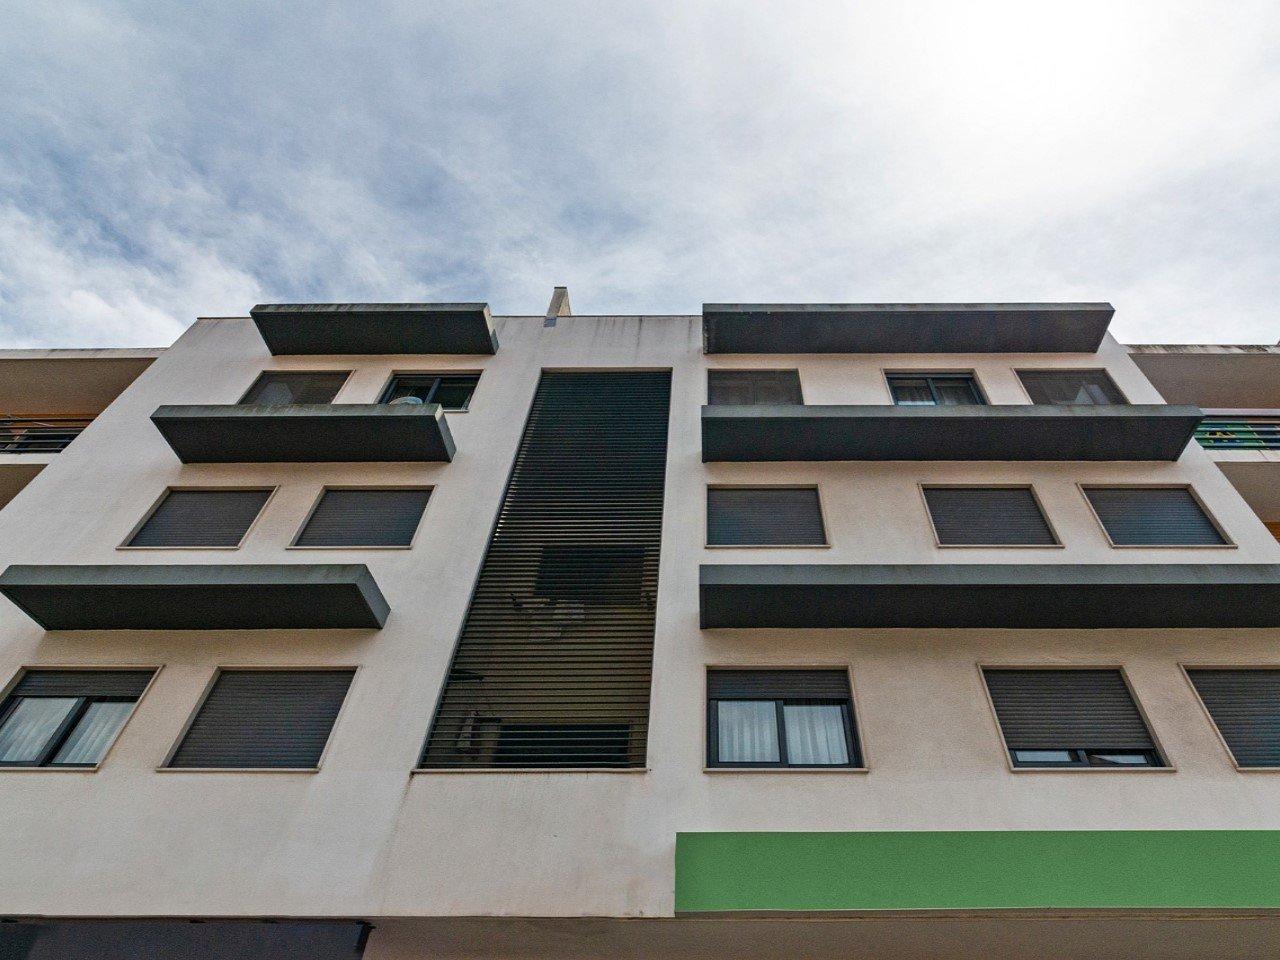 2 Bedroom Apartment Cascais, Lisbon Ref: AMA14148